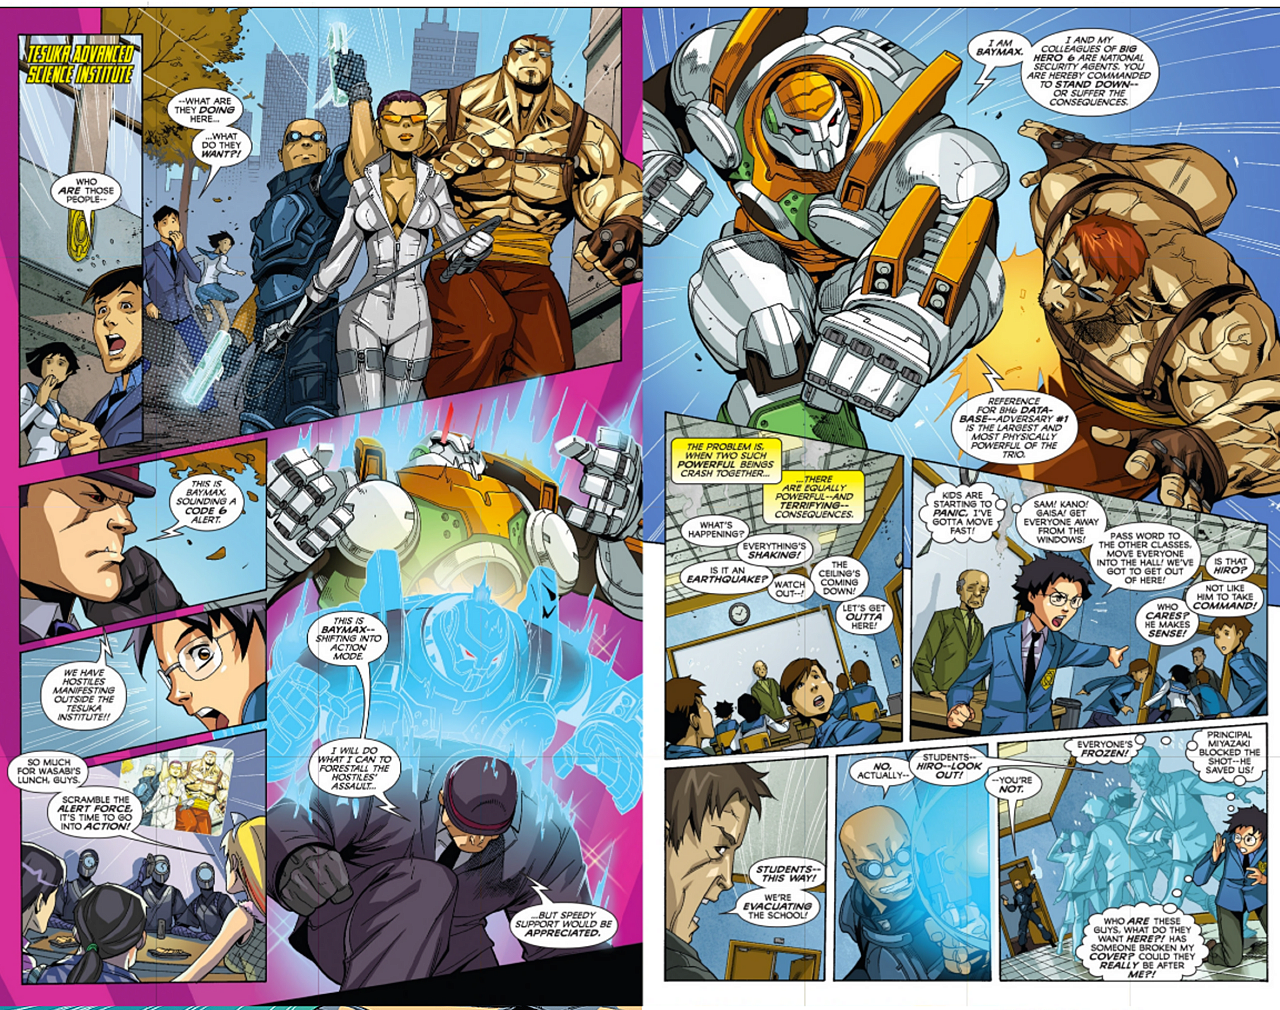 Big Hero Comic big hero 6 comic page 8bluehoung617 on deviantart